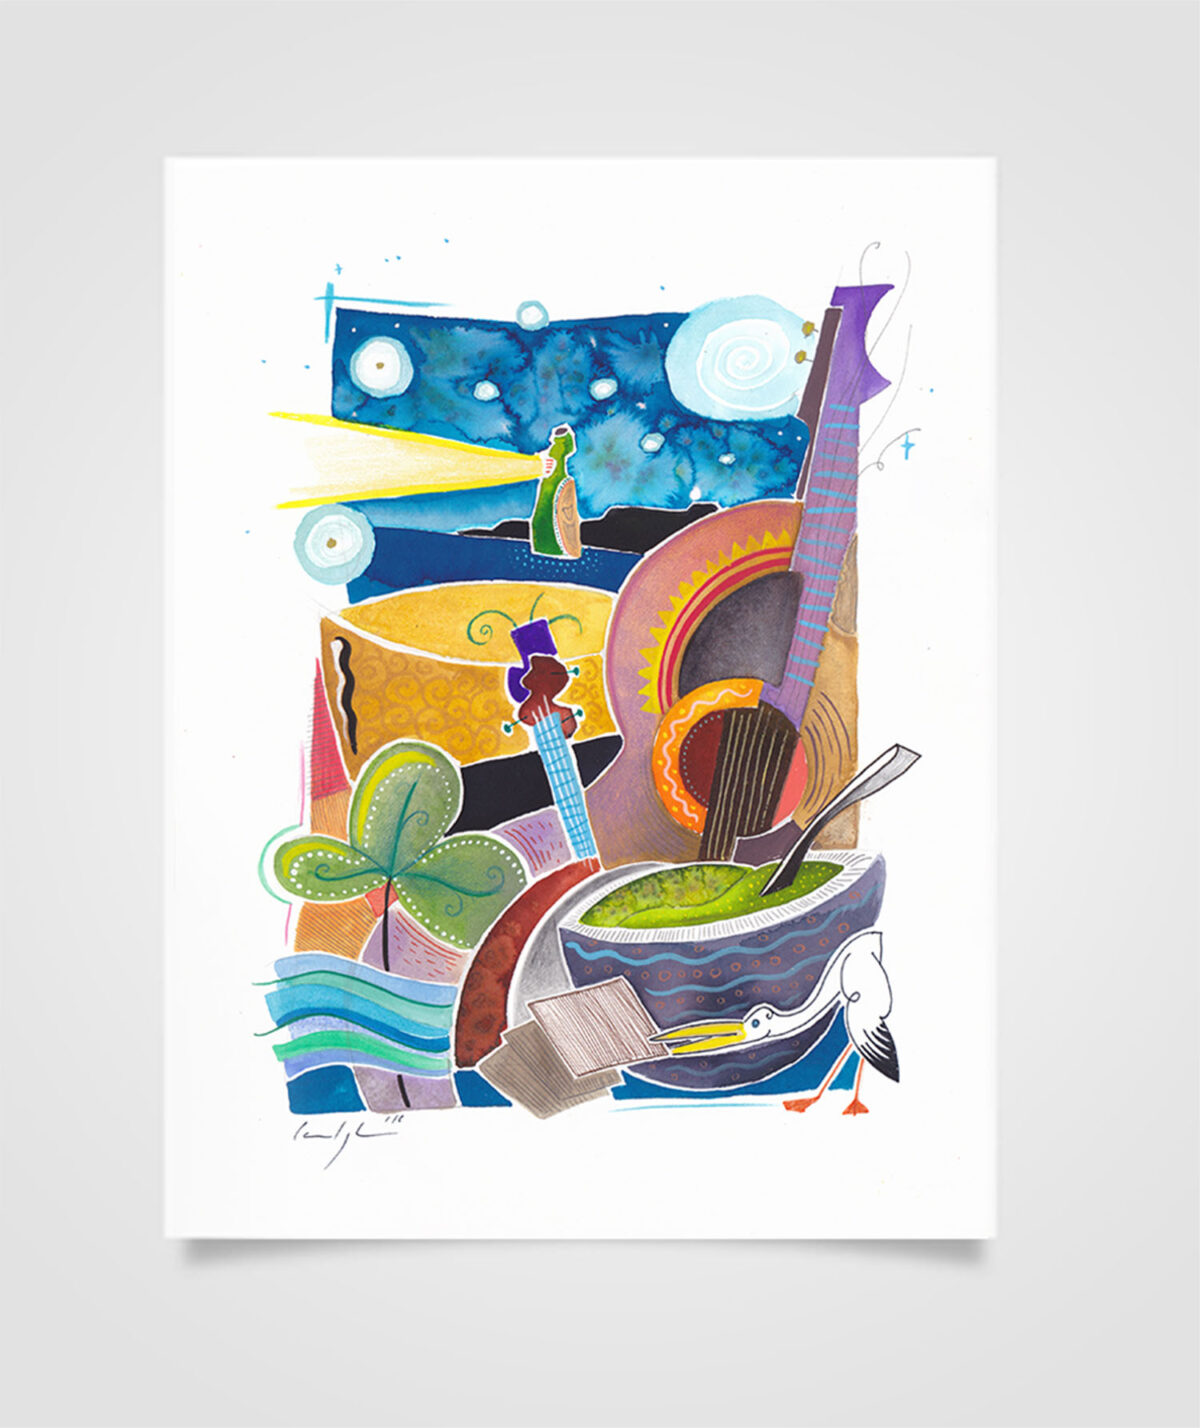 """Eire - Soup of the day"" Tecniche miste su carta, 21 x 29,7 cm (2016)"